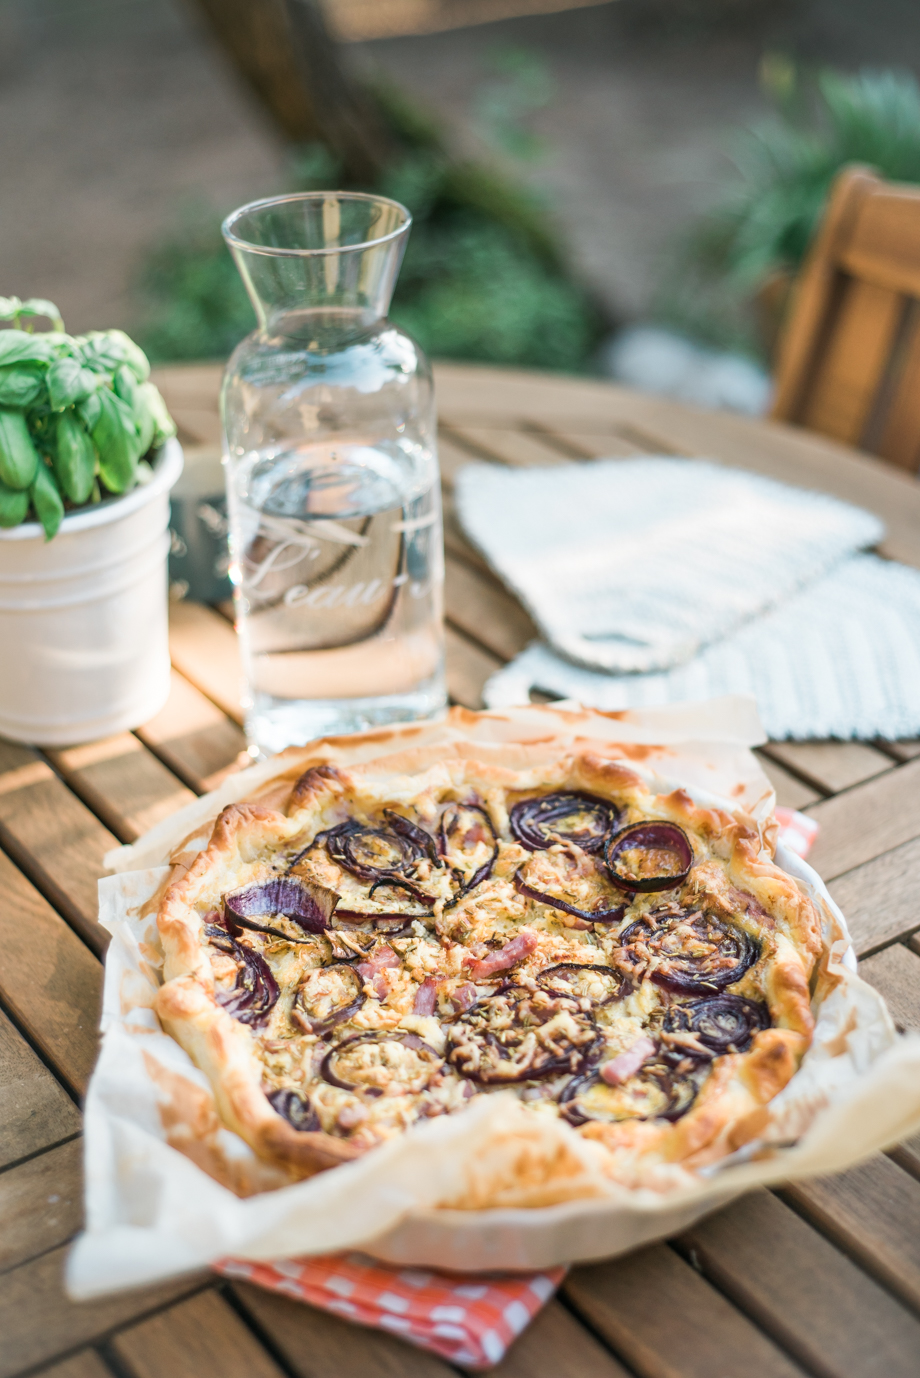 GATHER & INDULGE - French cheesy onion quiche